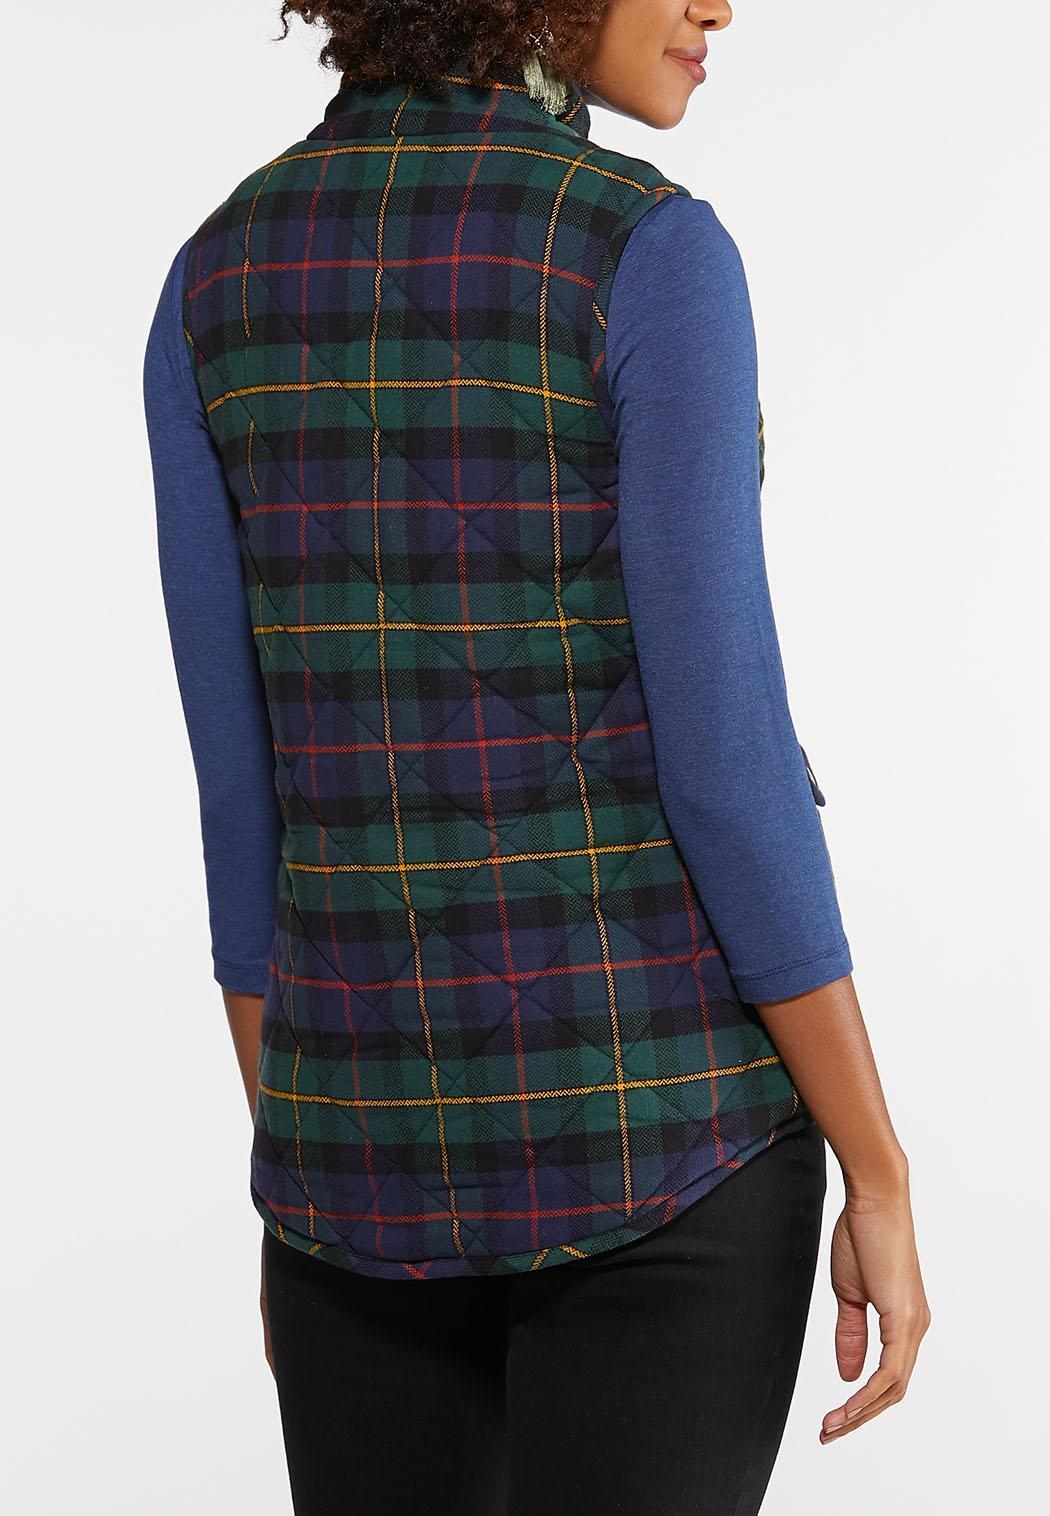 Plus Size Plaid Puffer Vest (Item #43997606)